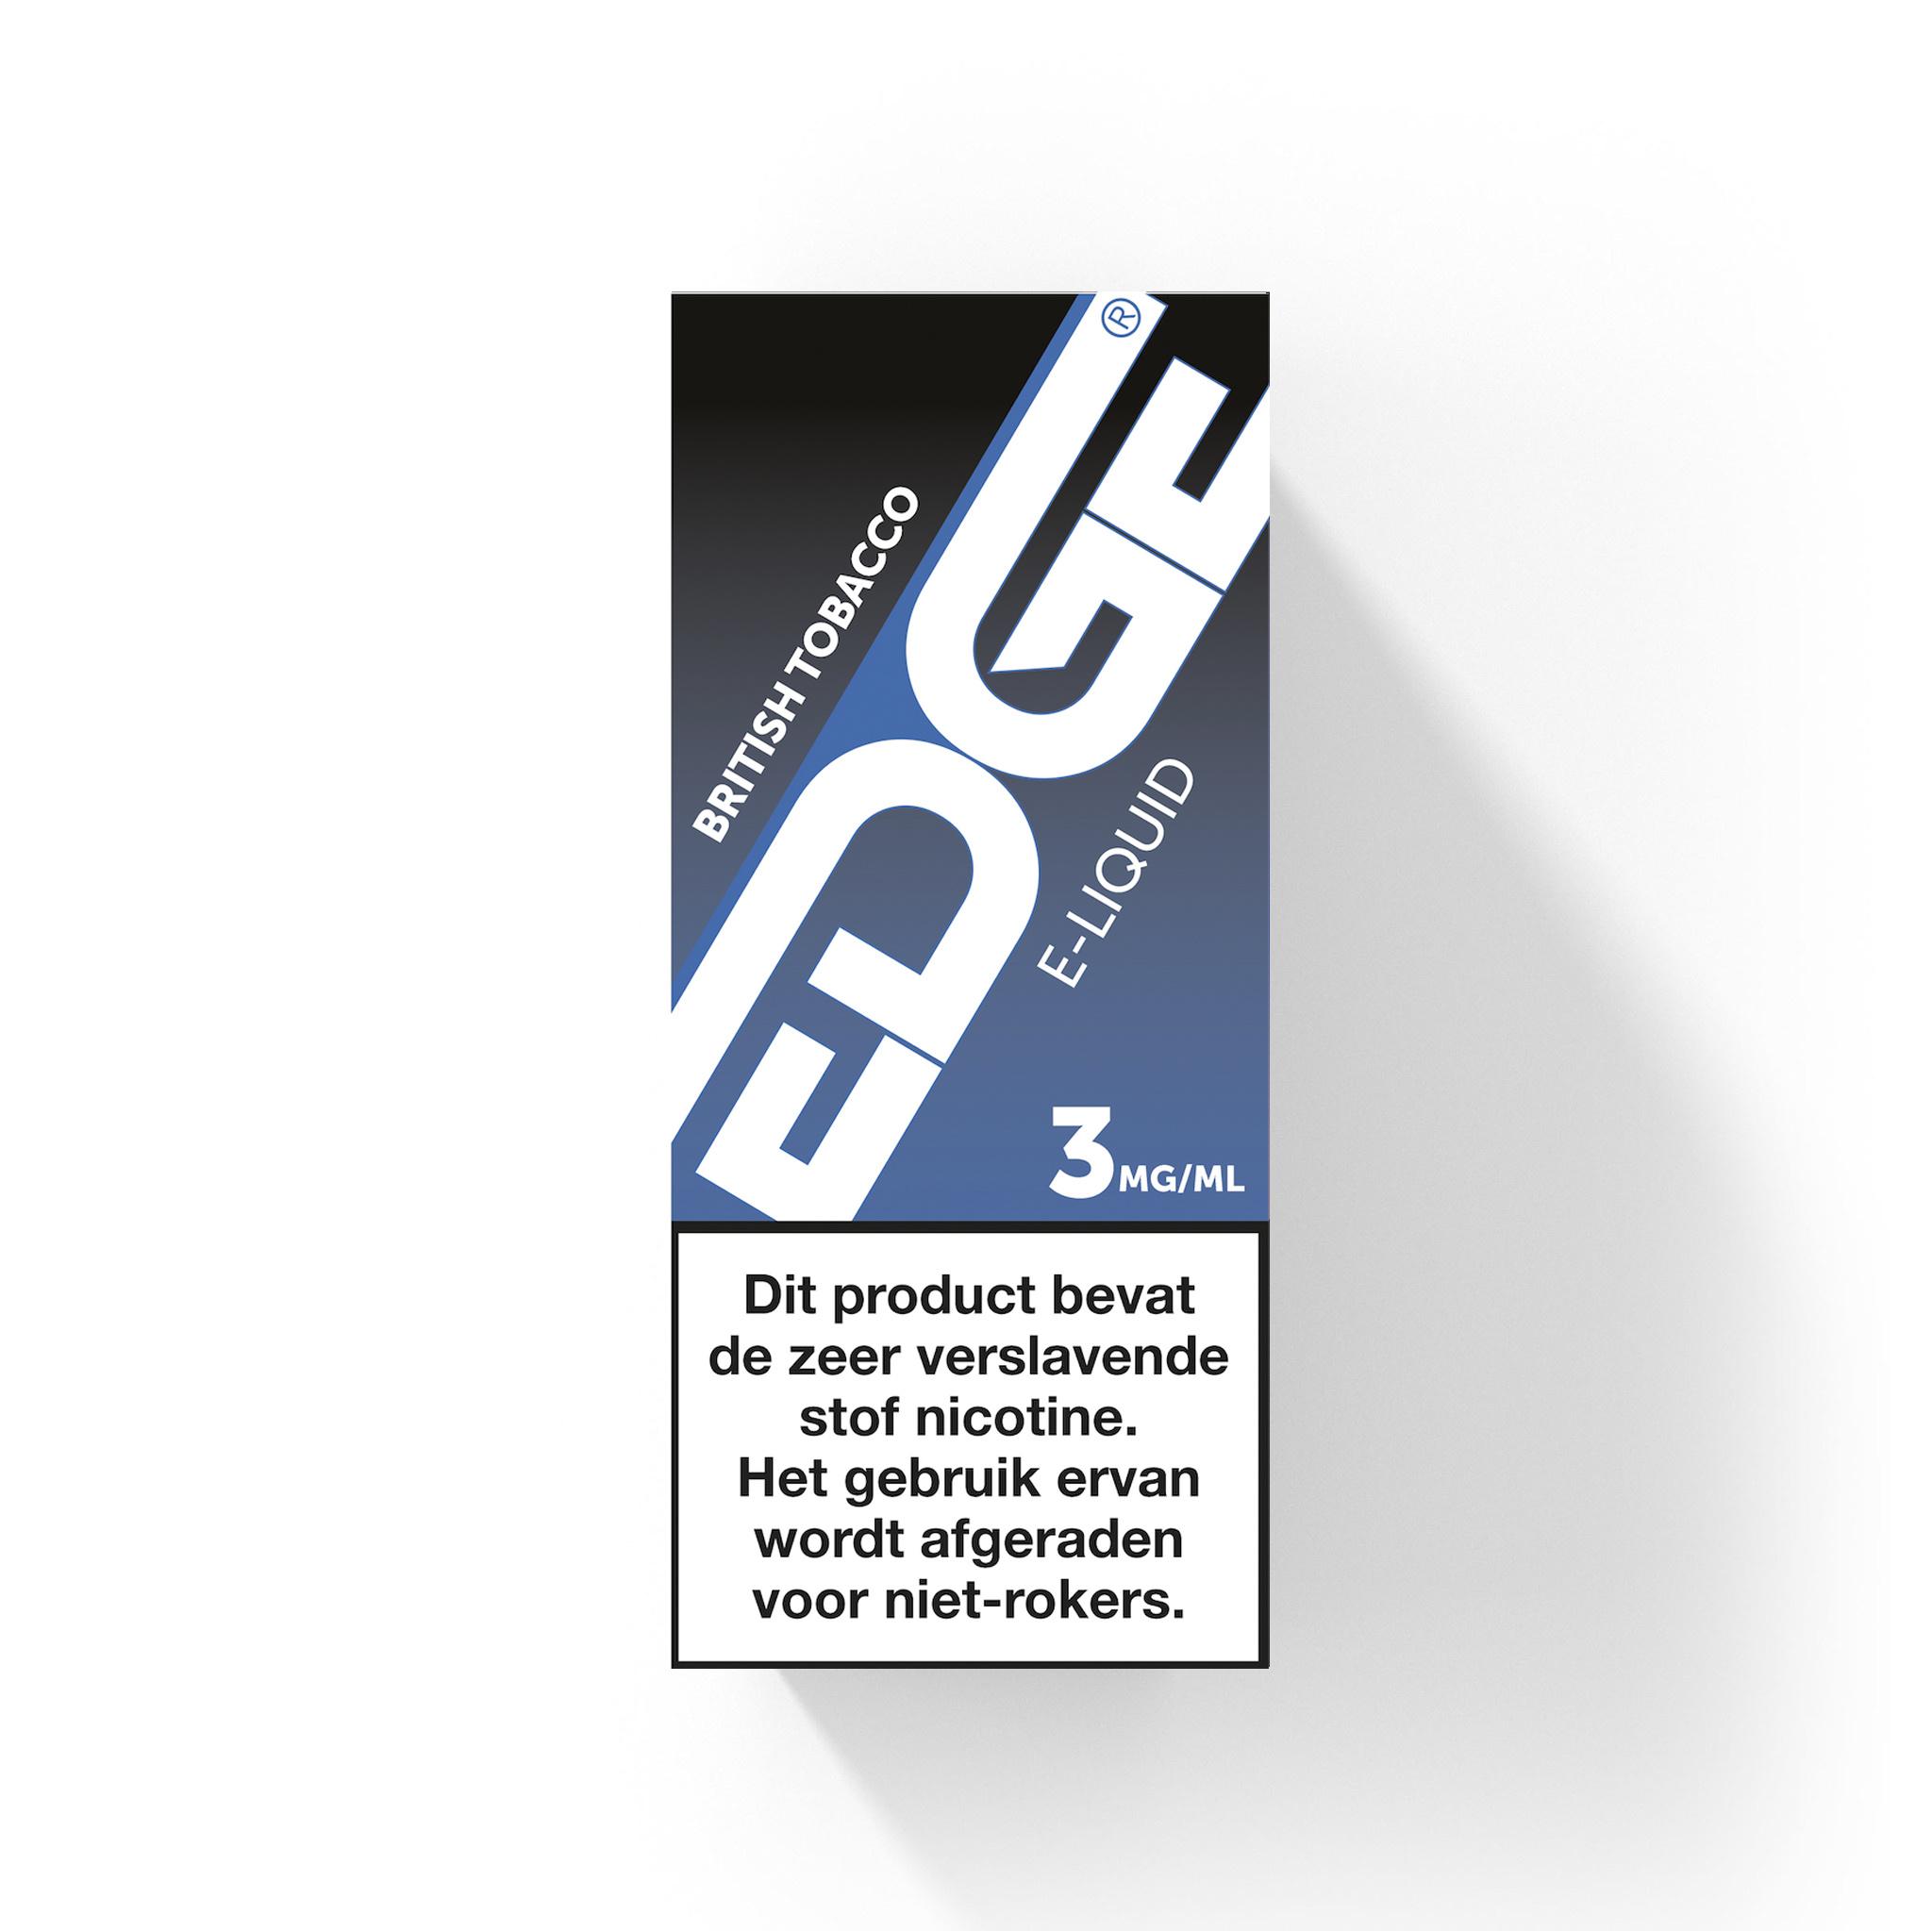 Edge - British Tobacco